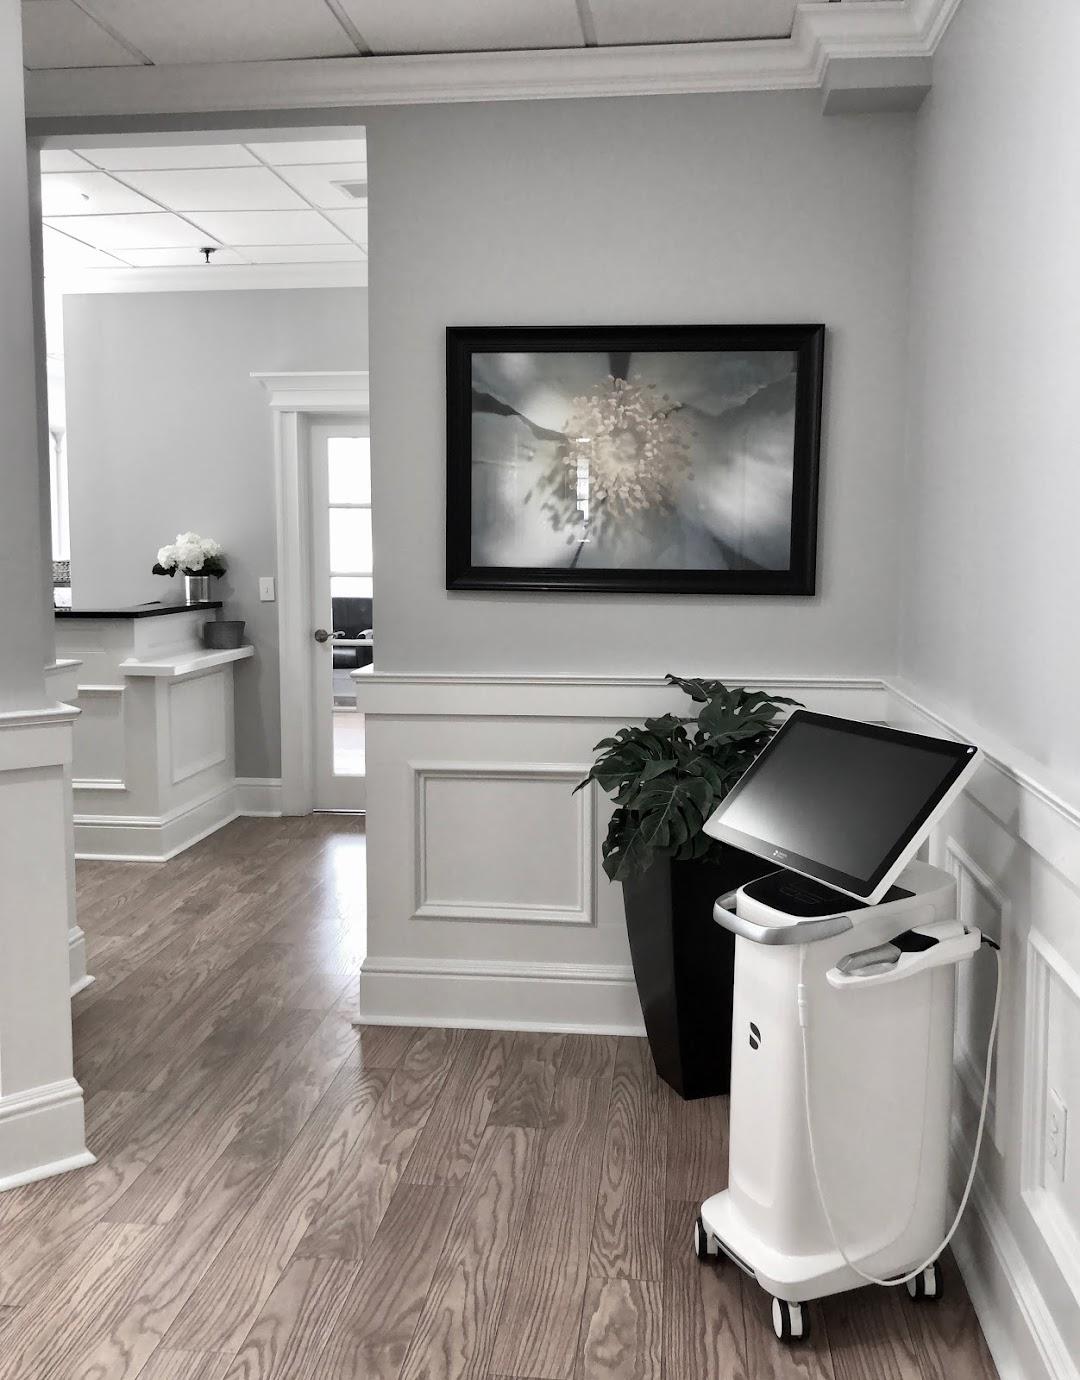 Dental Center of Huntington